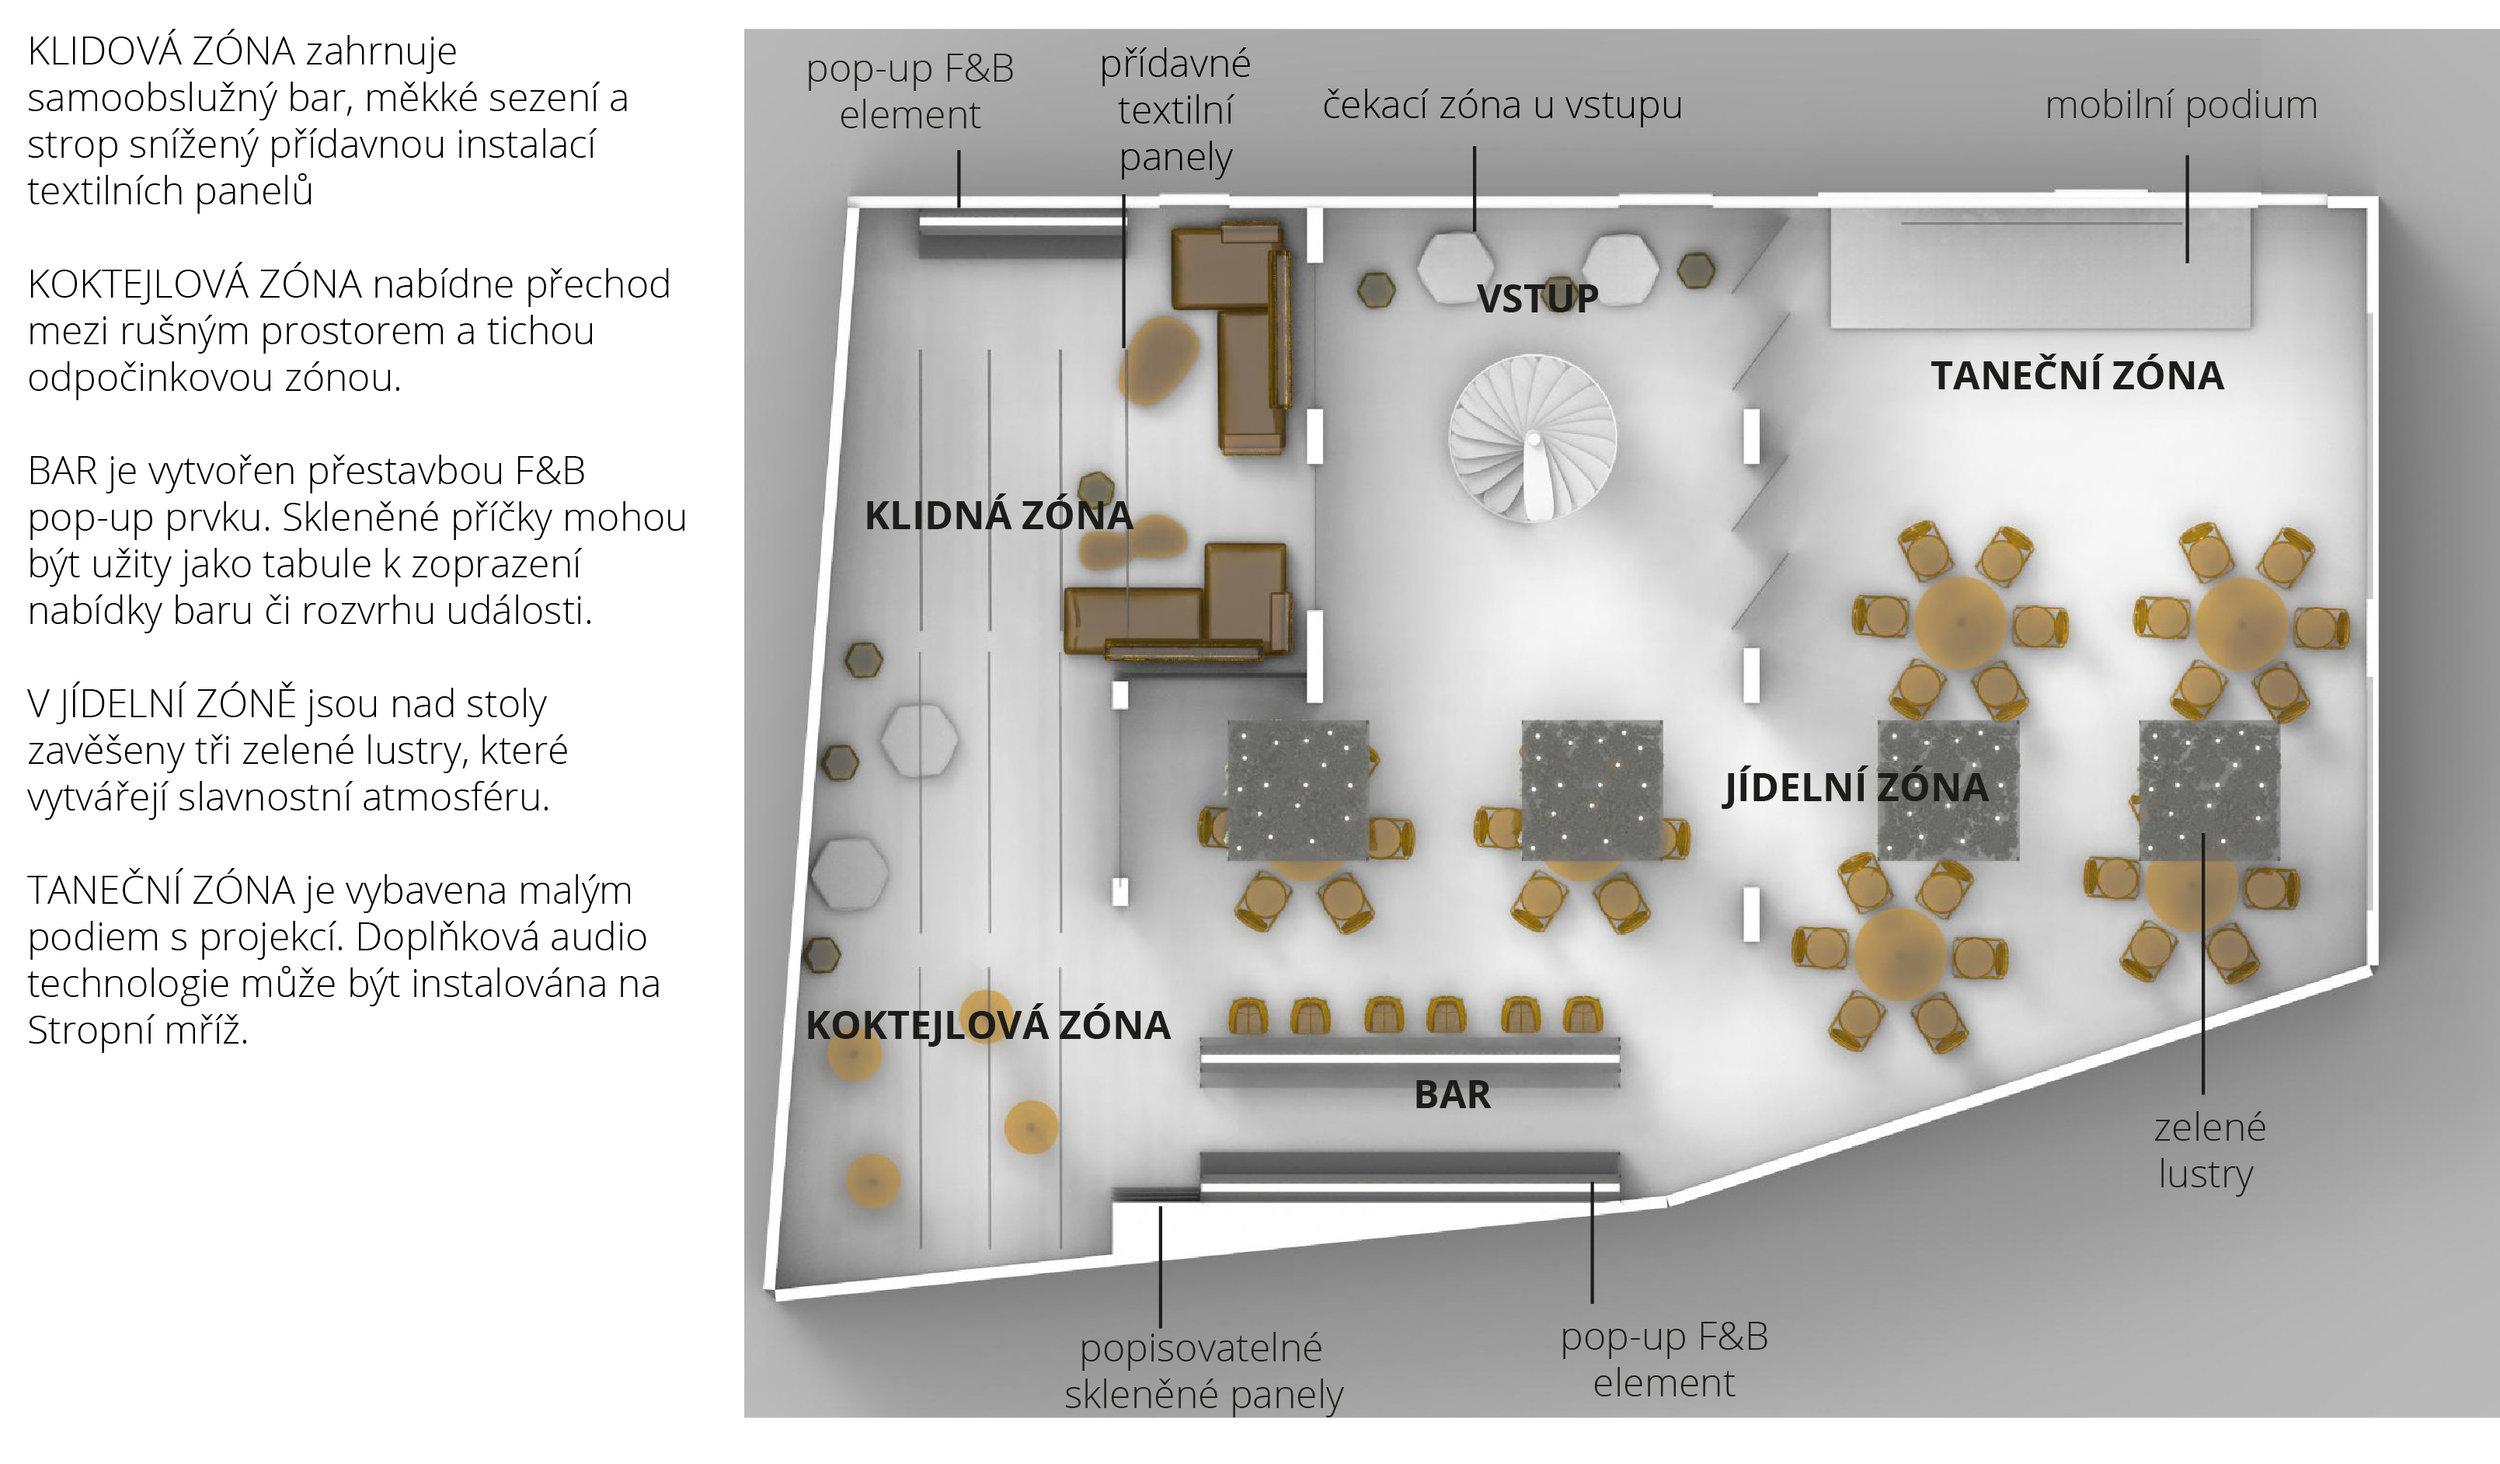 event layout-04.jpg